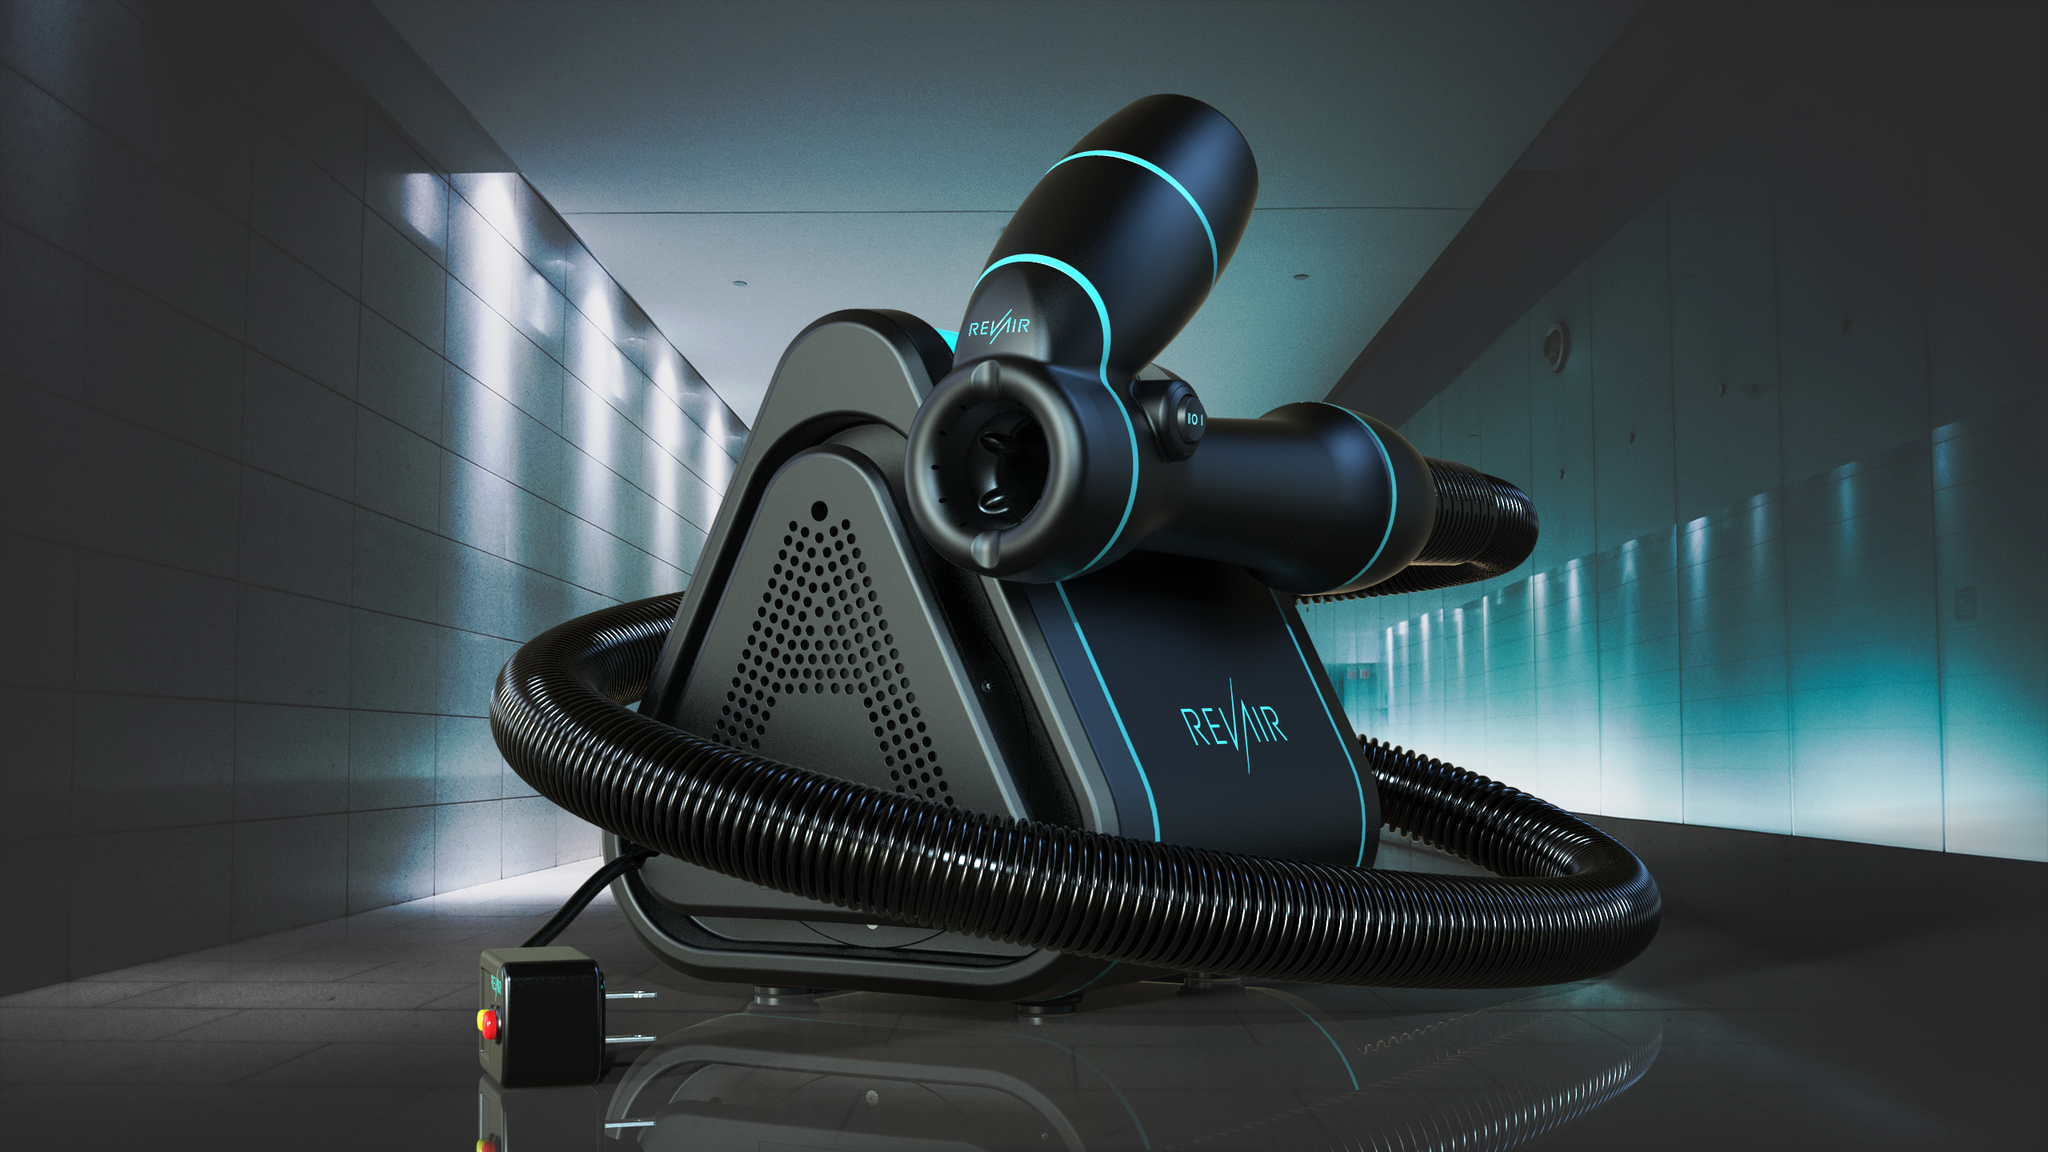 REVAIR reverseair dryer Best hair dryer, Hair dryer, Dryer